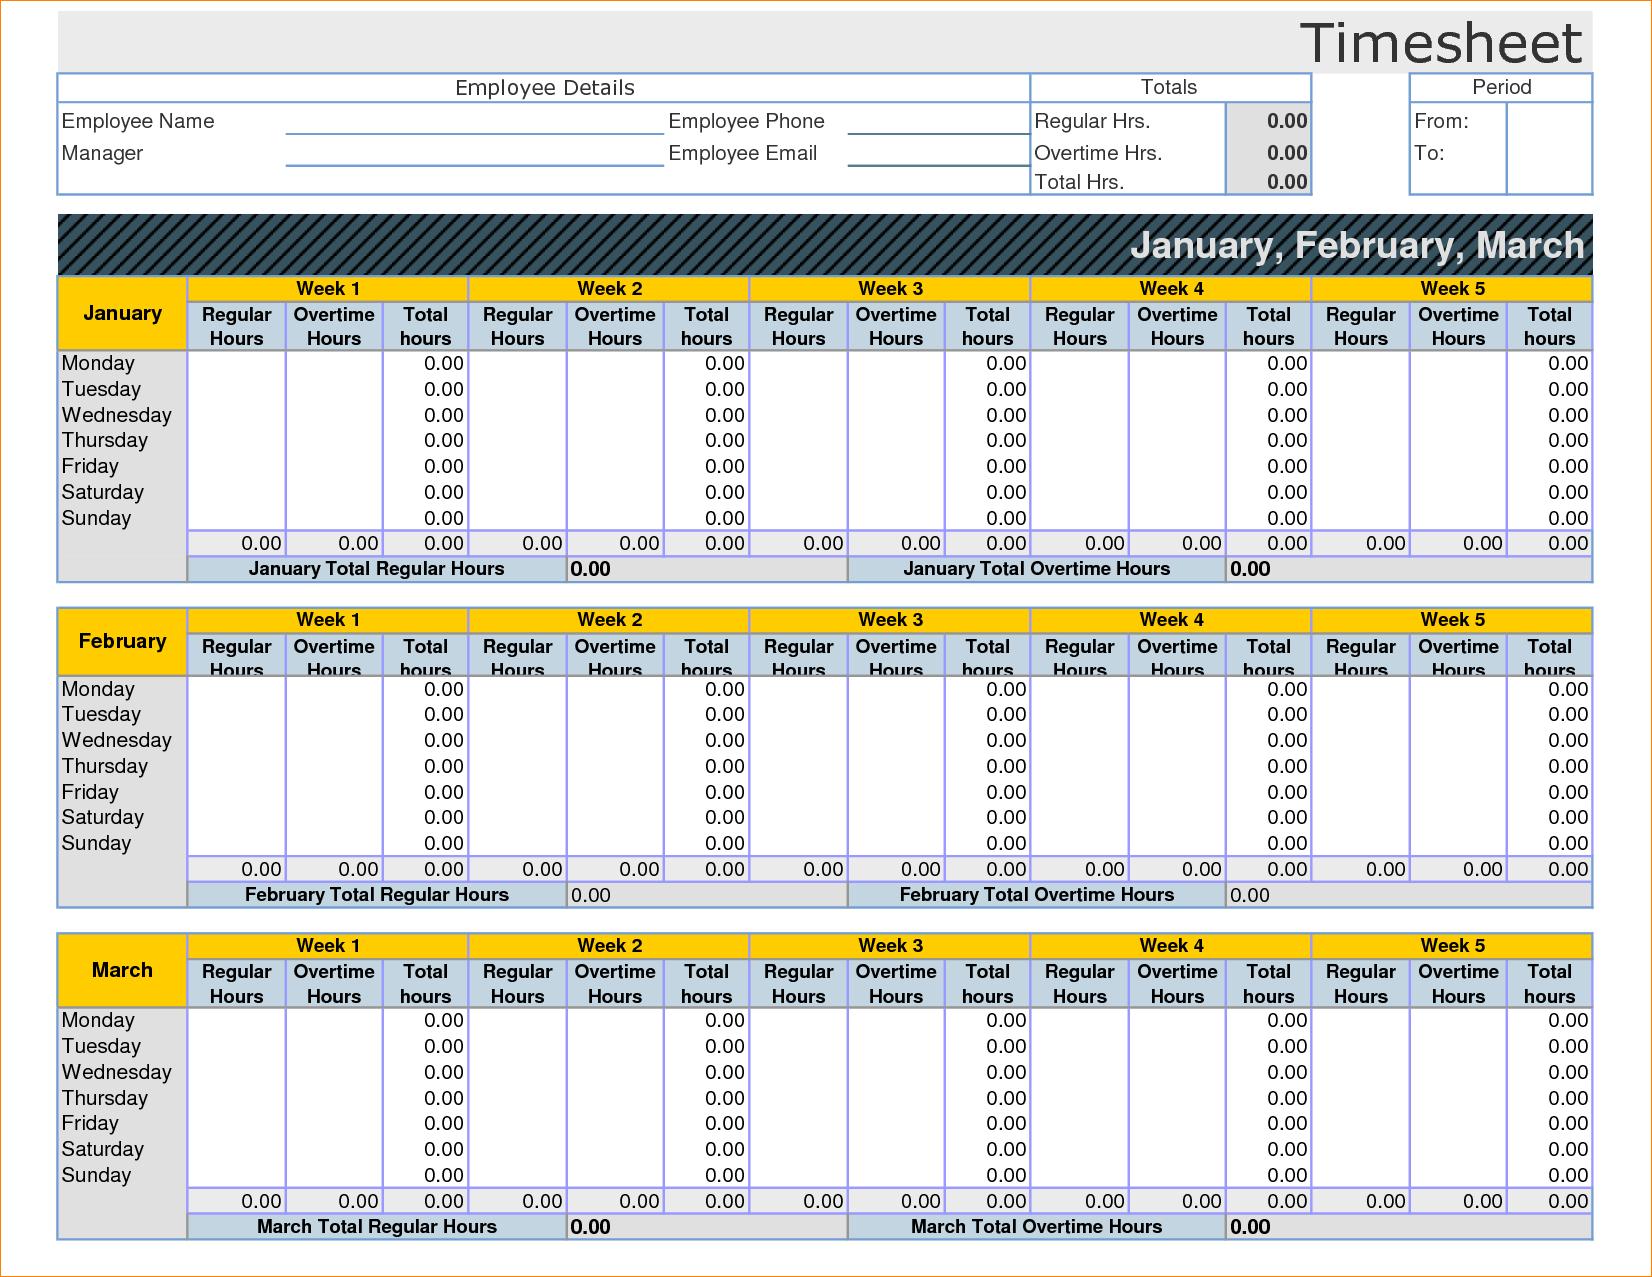 Employee Timesheet Template Excel Spreadsheet 14 - Isipingo Secondary intended for Employee Timesheet Spreadsheet